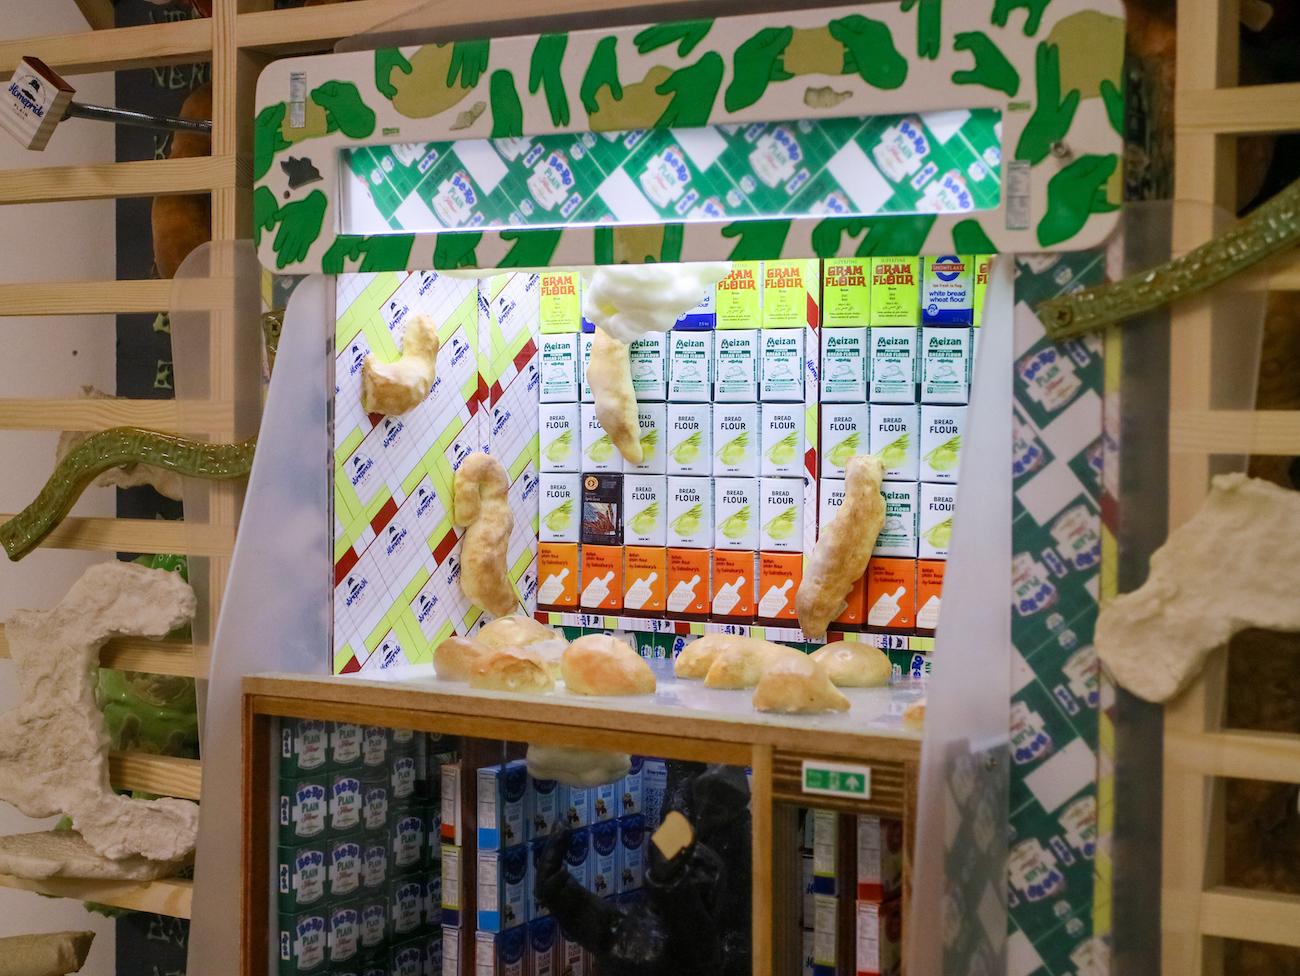 Kara Chin, Sims Dream Flour Shop (detail), 2021. Mixed Media*. 193 x 80 x 30 cm. Photographer: Harley Kuyck-Cohen.